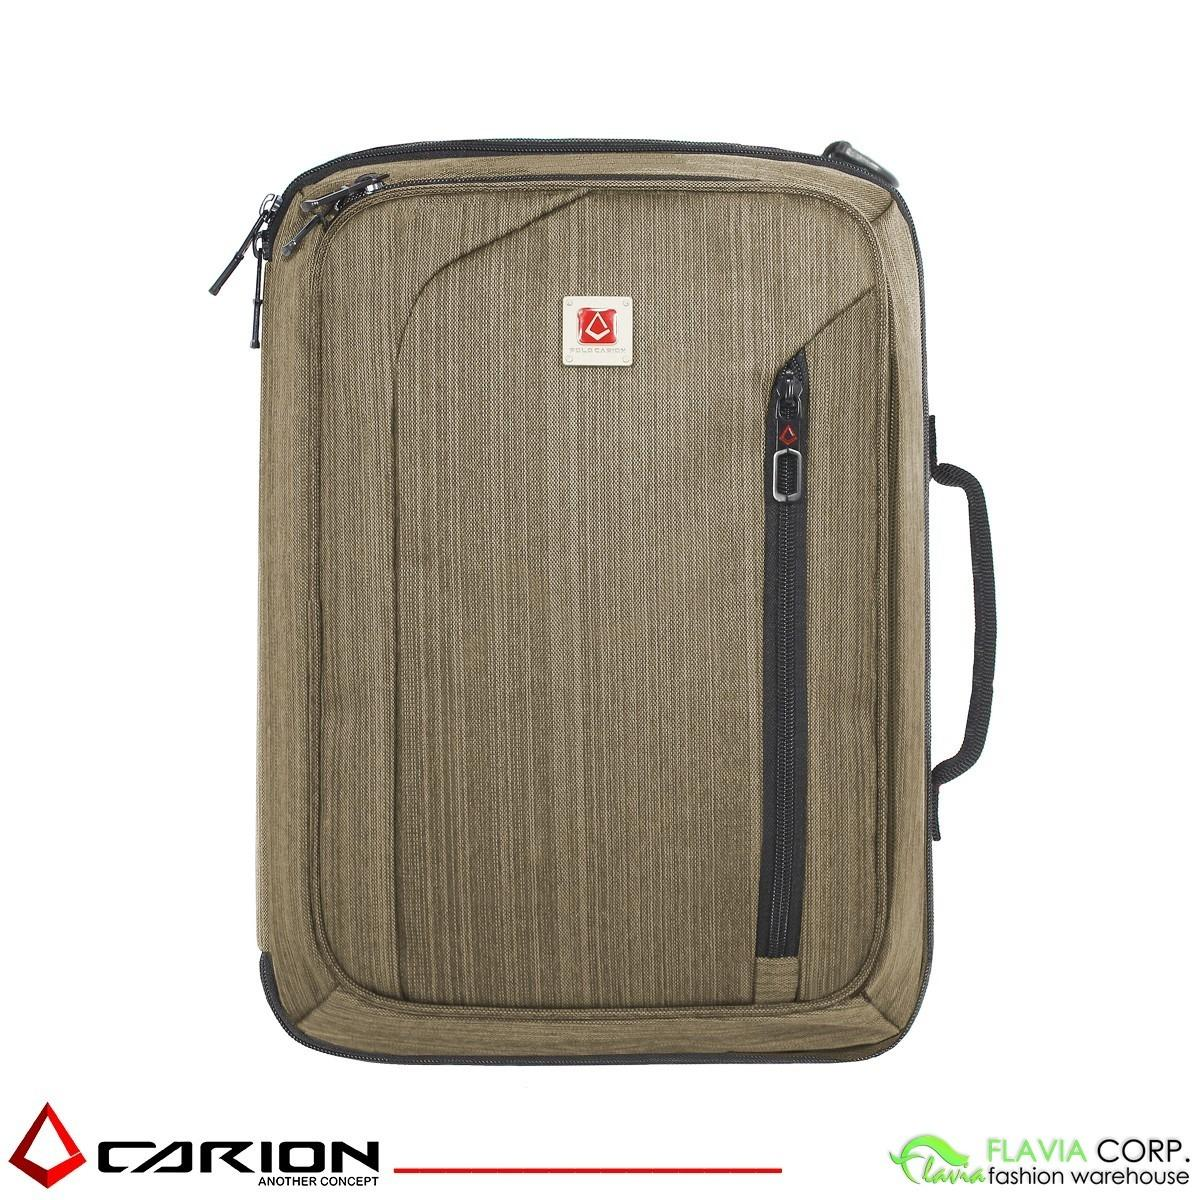 Review Tas Laptop Multifungsi Ransel Selempang 330003 Di Jawa Barat